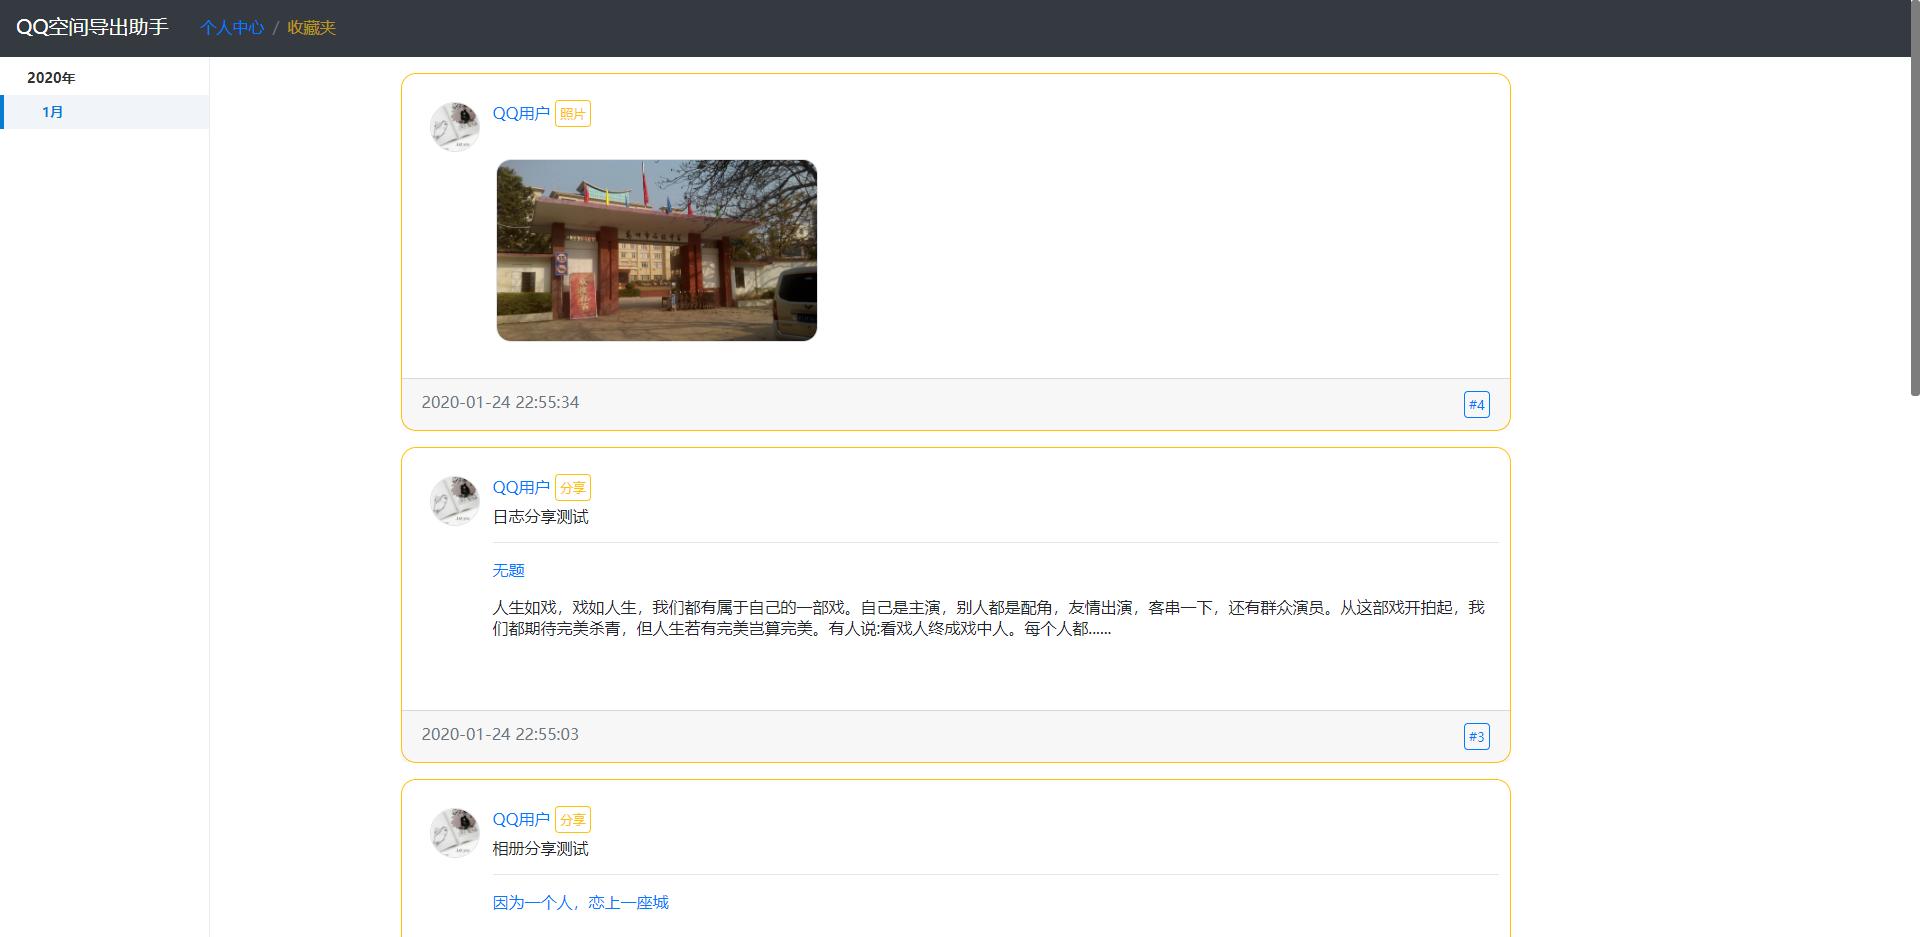 QQ空间备份-收藏夹